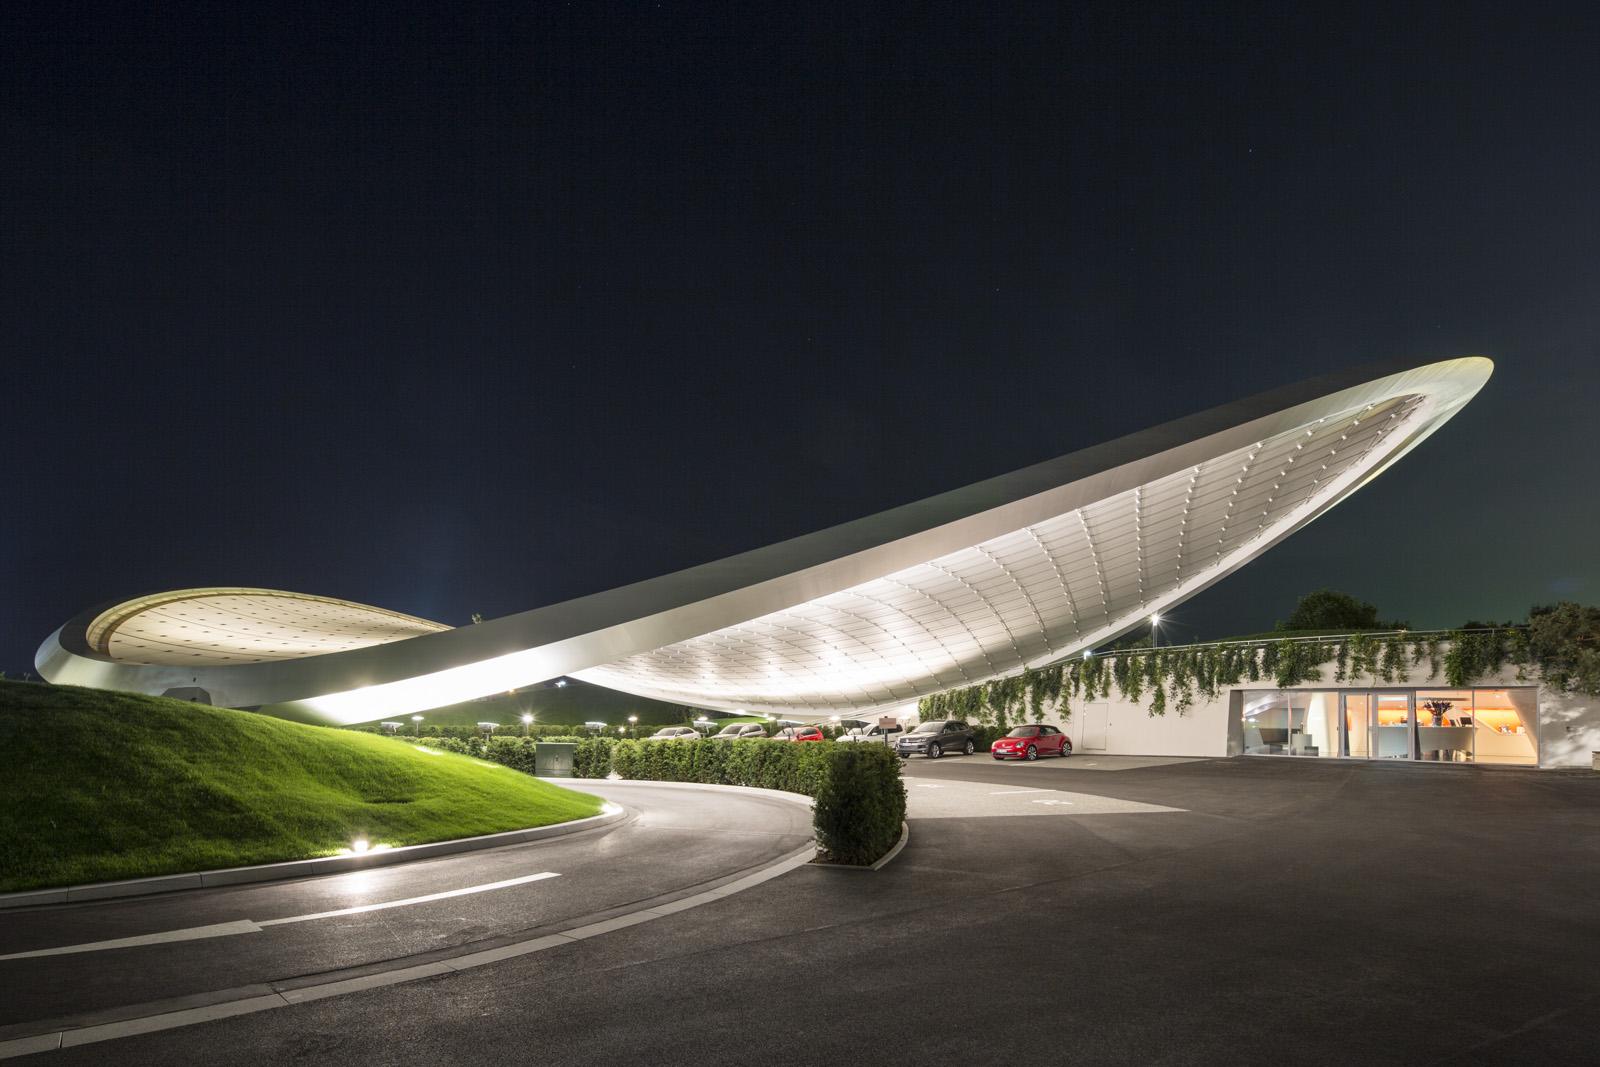 autostadt roof and service pavilion | arcdog, Innenarchitektur ideen